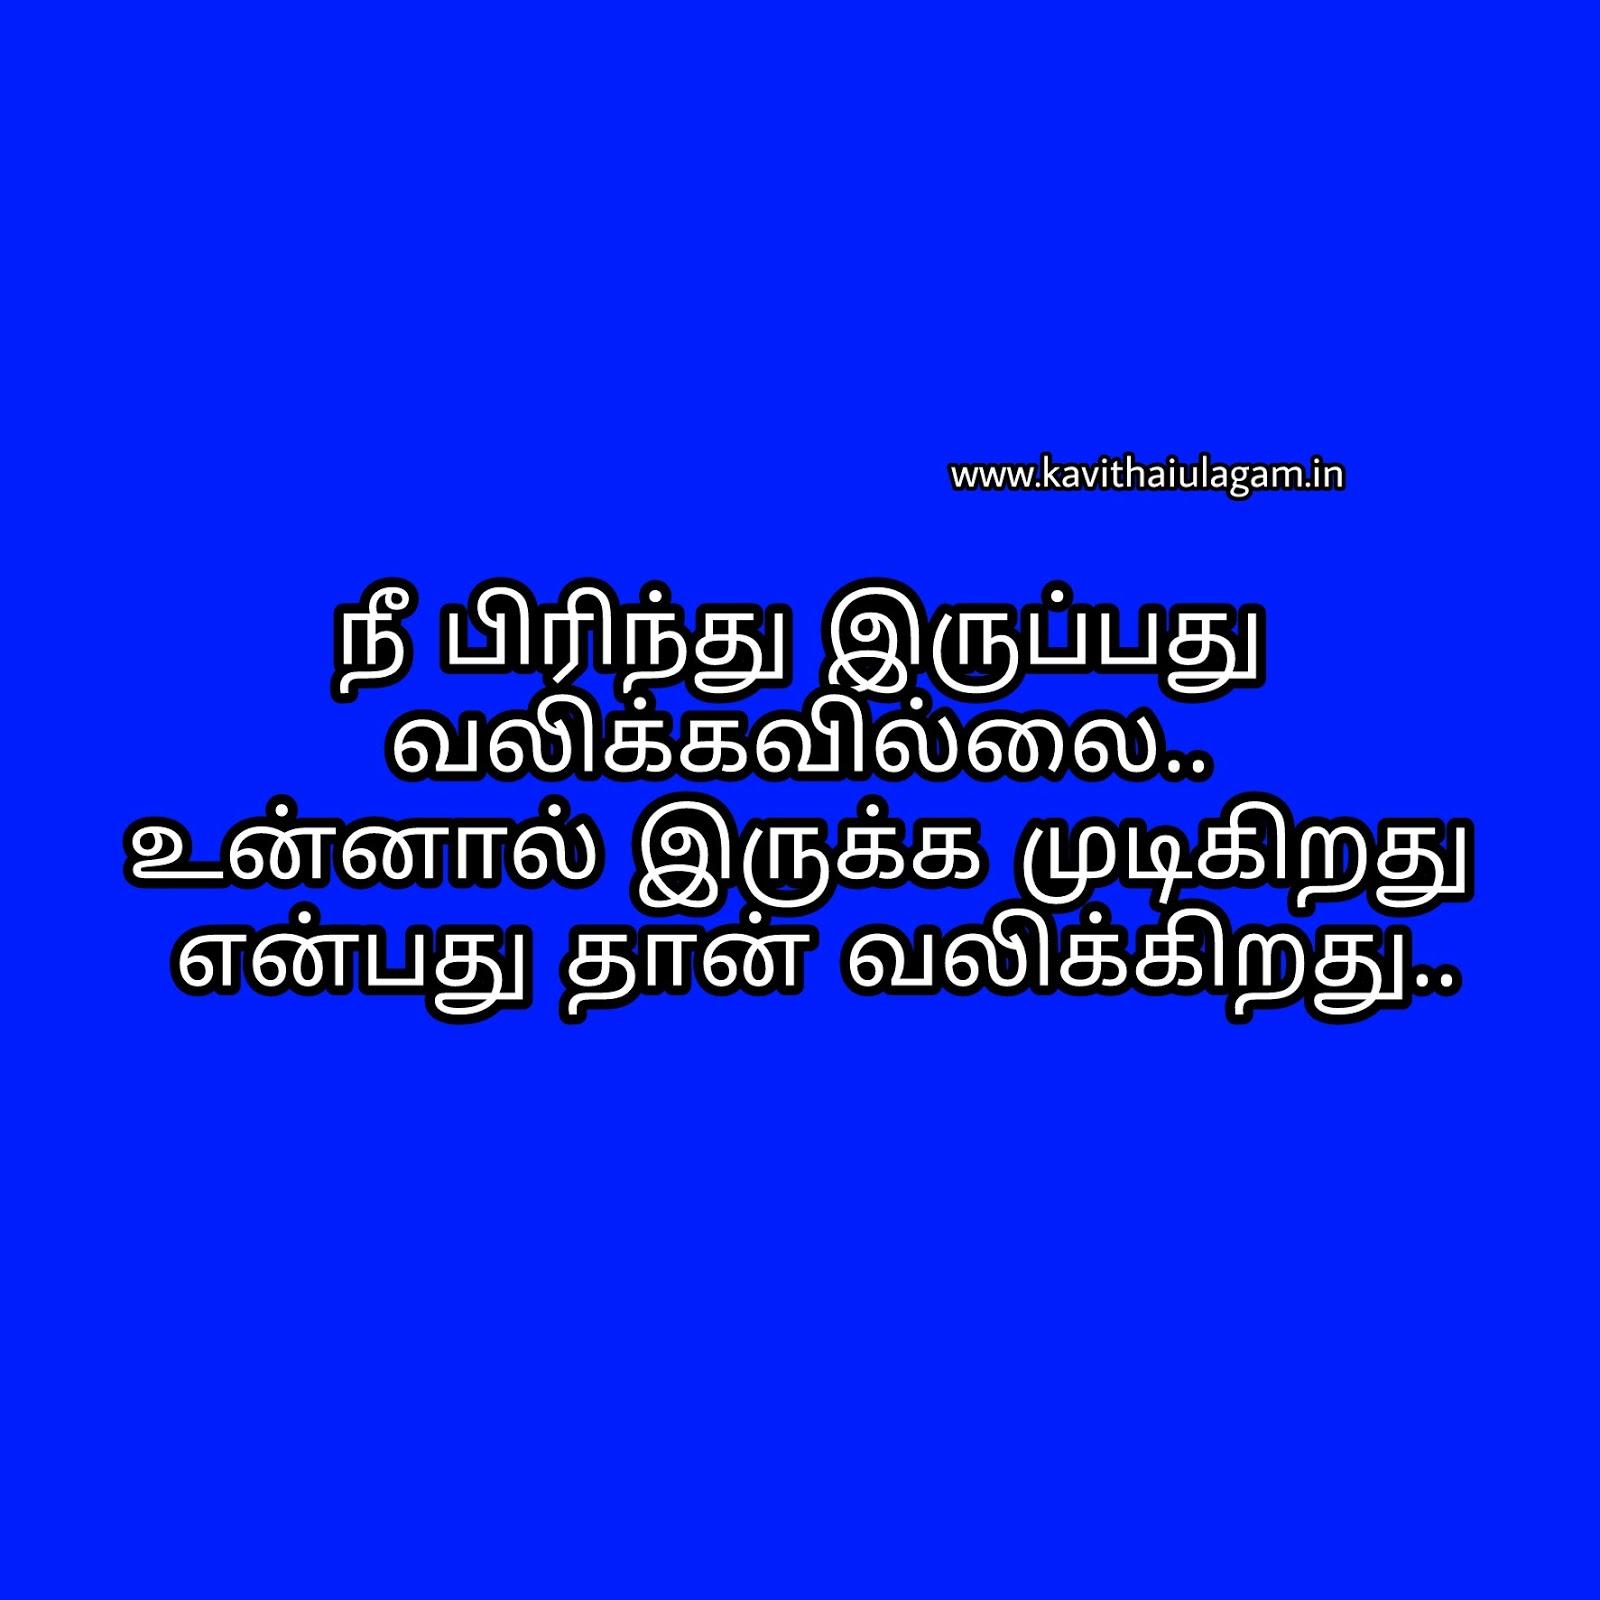 Sad love kavithai in tamil kadhal sogam kavithai images sad love pirivu kavithai kadhal vali kavithai tamil kavithai love images hd altavistaventures Gallery